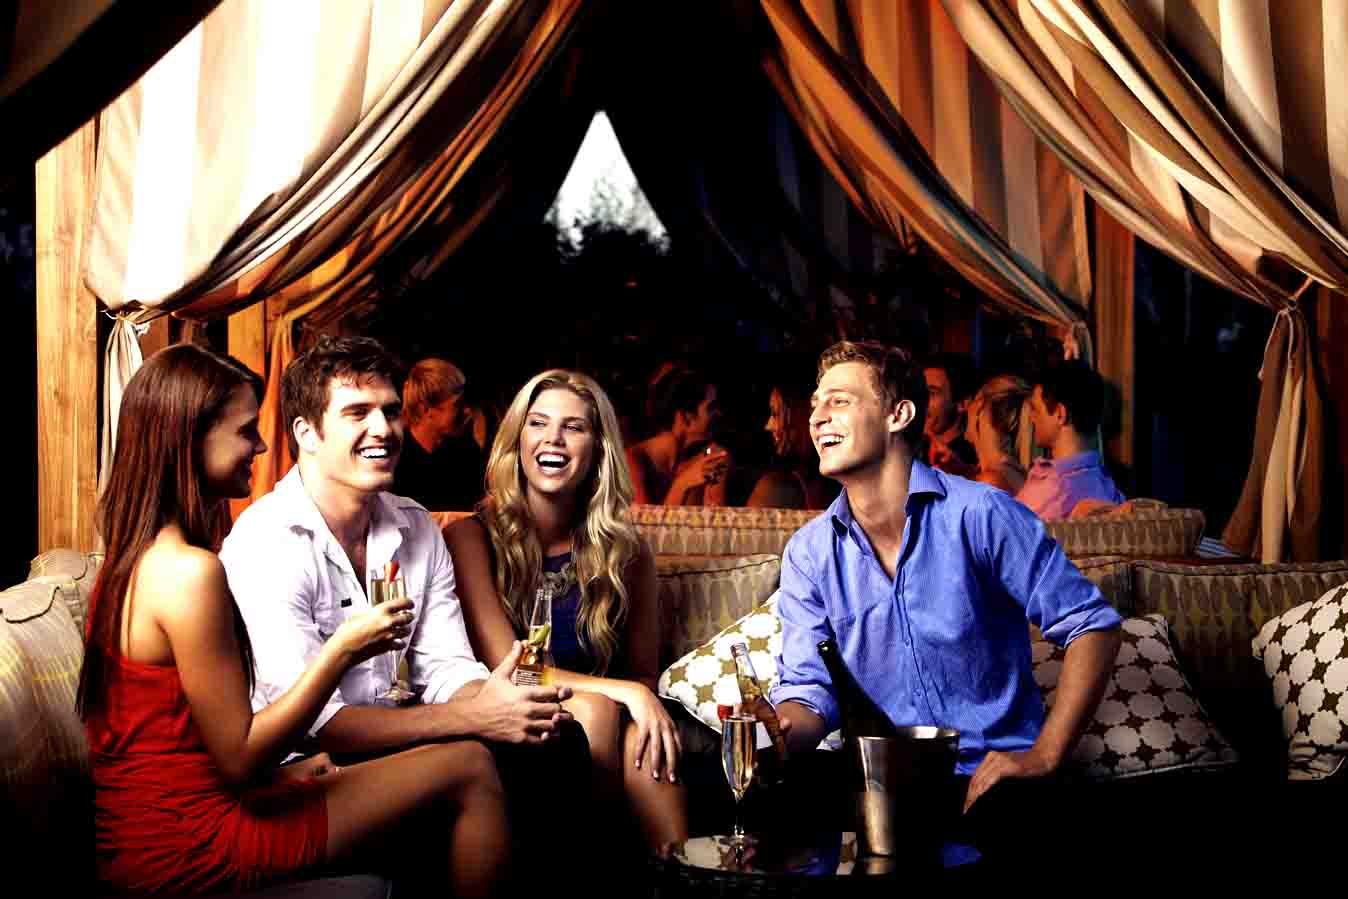 cabana-bar-gold-coast-bars-qld-best-top-good-footy-clubs-cocktail-night-club-010.jpg